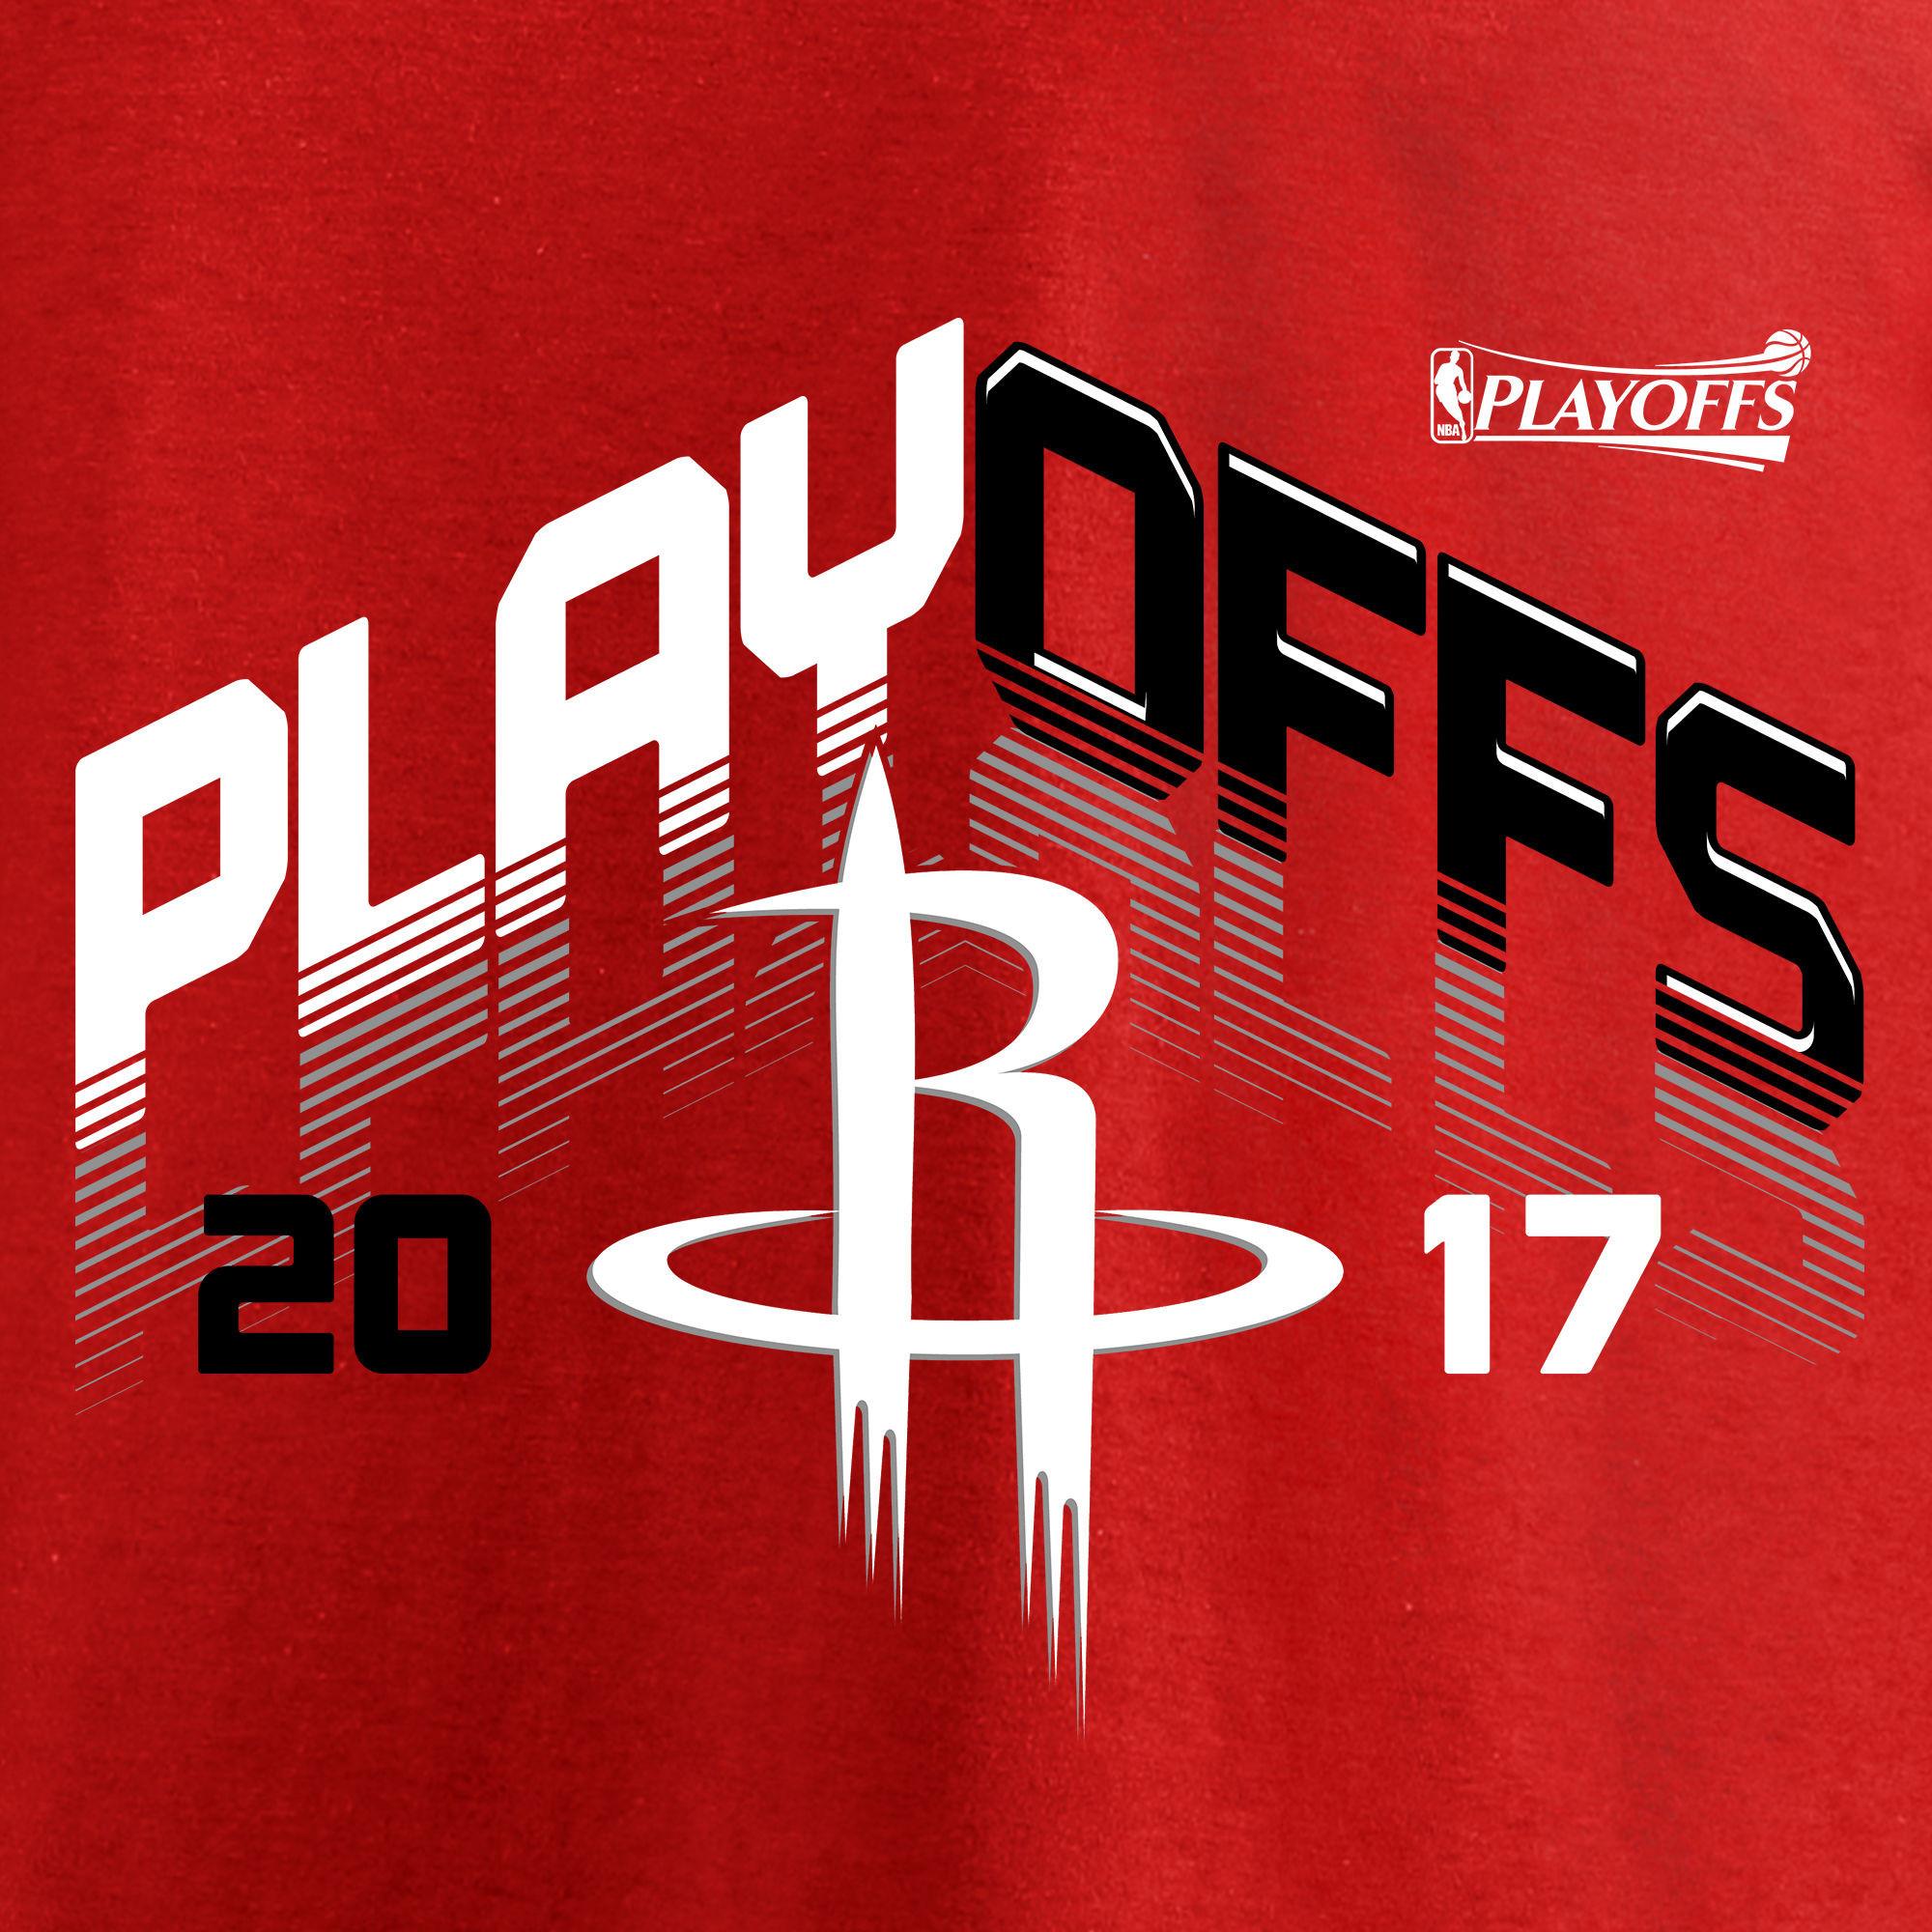 Houston Rockets | 2017 NBA Playoffs